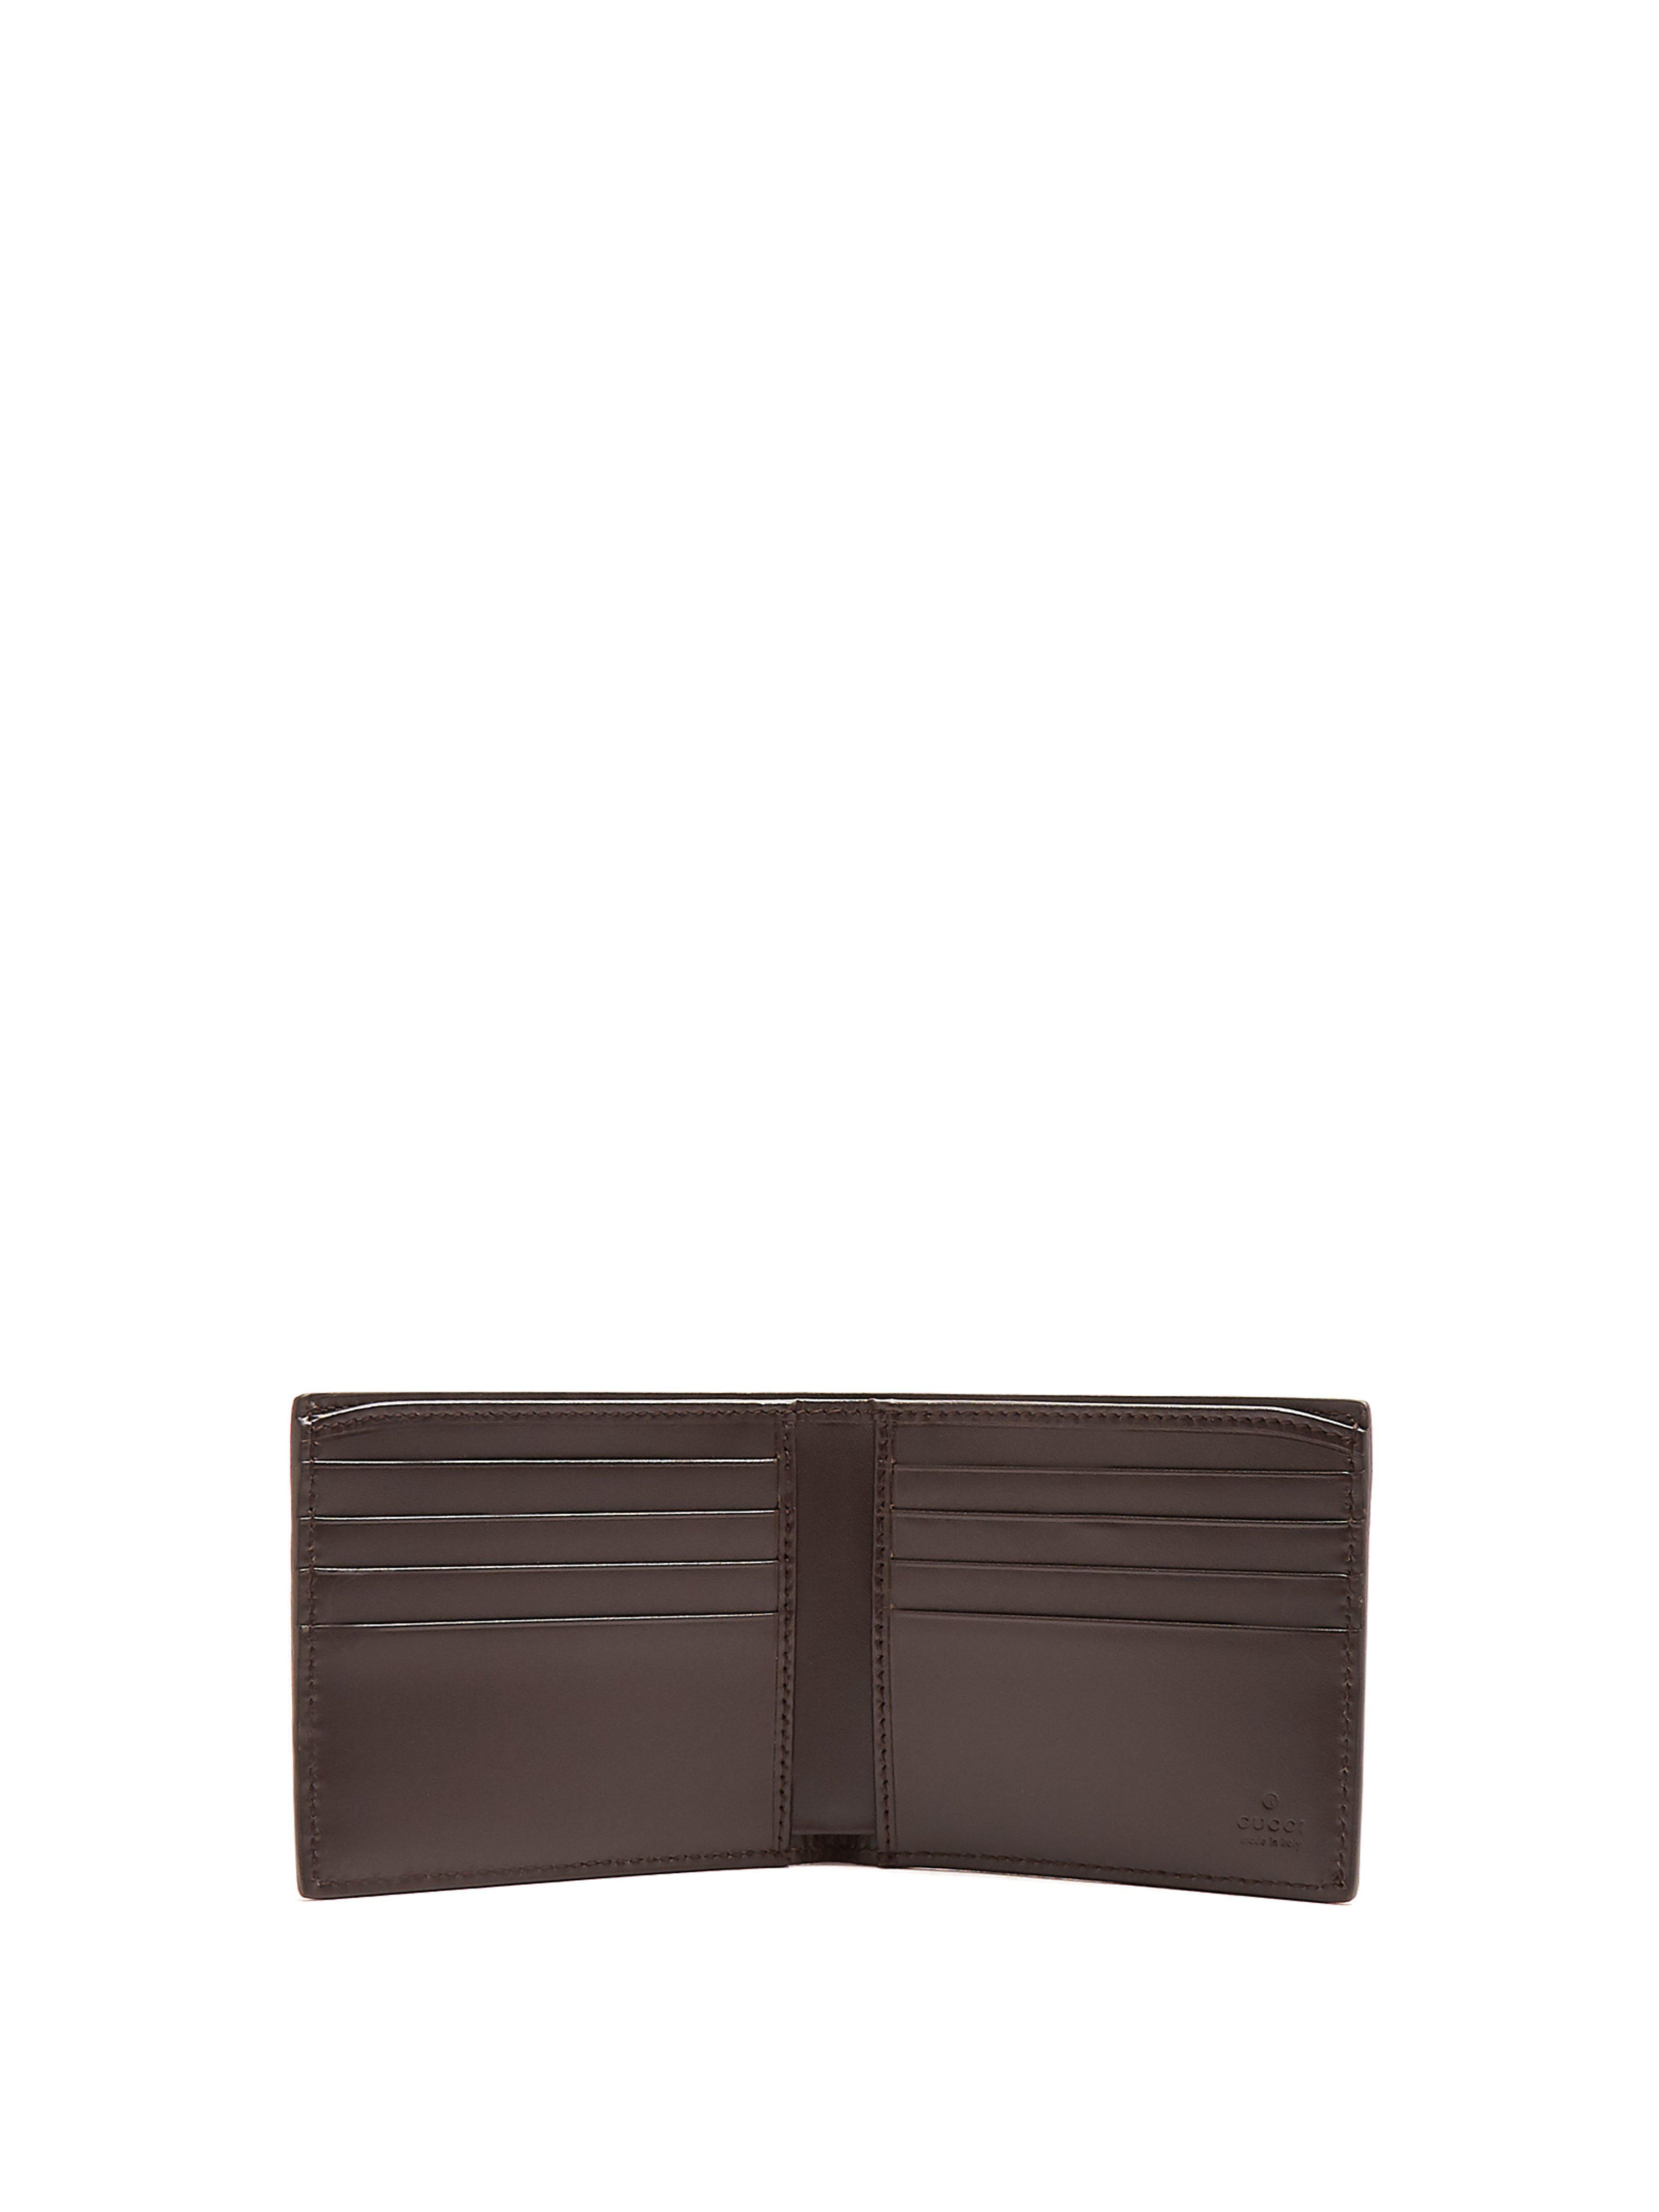 11e7b8bbf718 Gucci Gg Debossed Bi Fold Leather Wallet in Brown for Men - Lyst